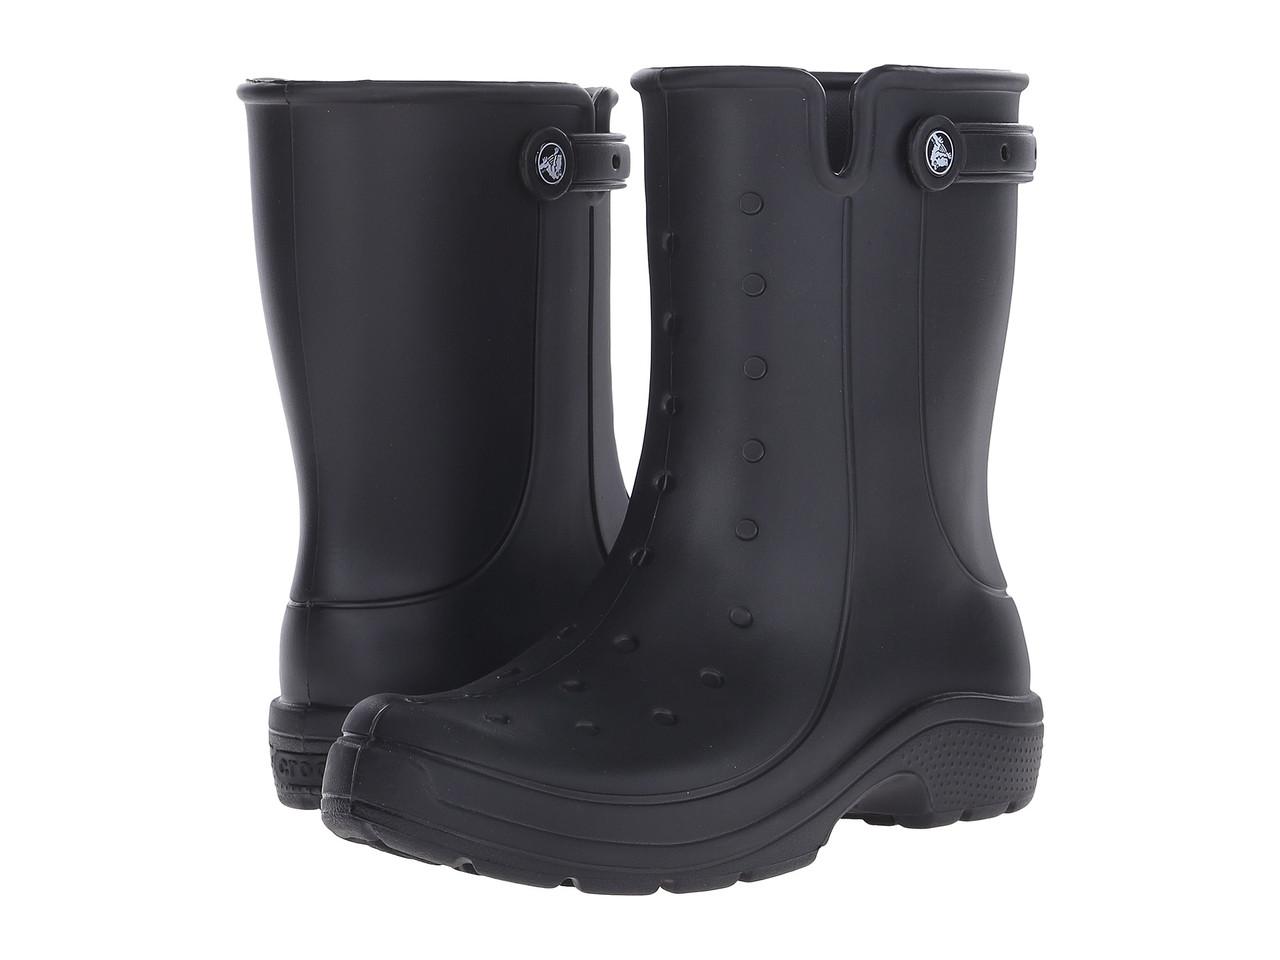 6029a44e5e03 Сапоги резиновые Crocs Reny II Boot. Продажа, цена в Киеве. сапоги мужские  от ...